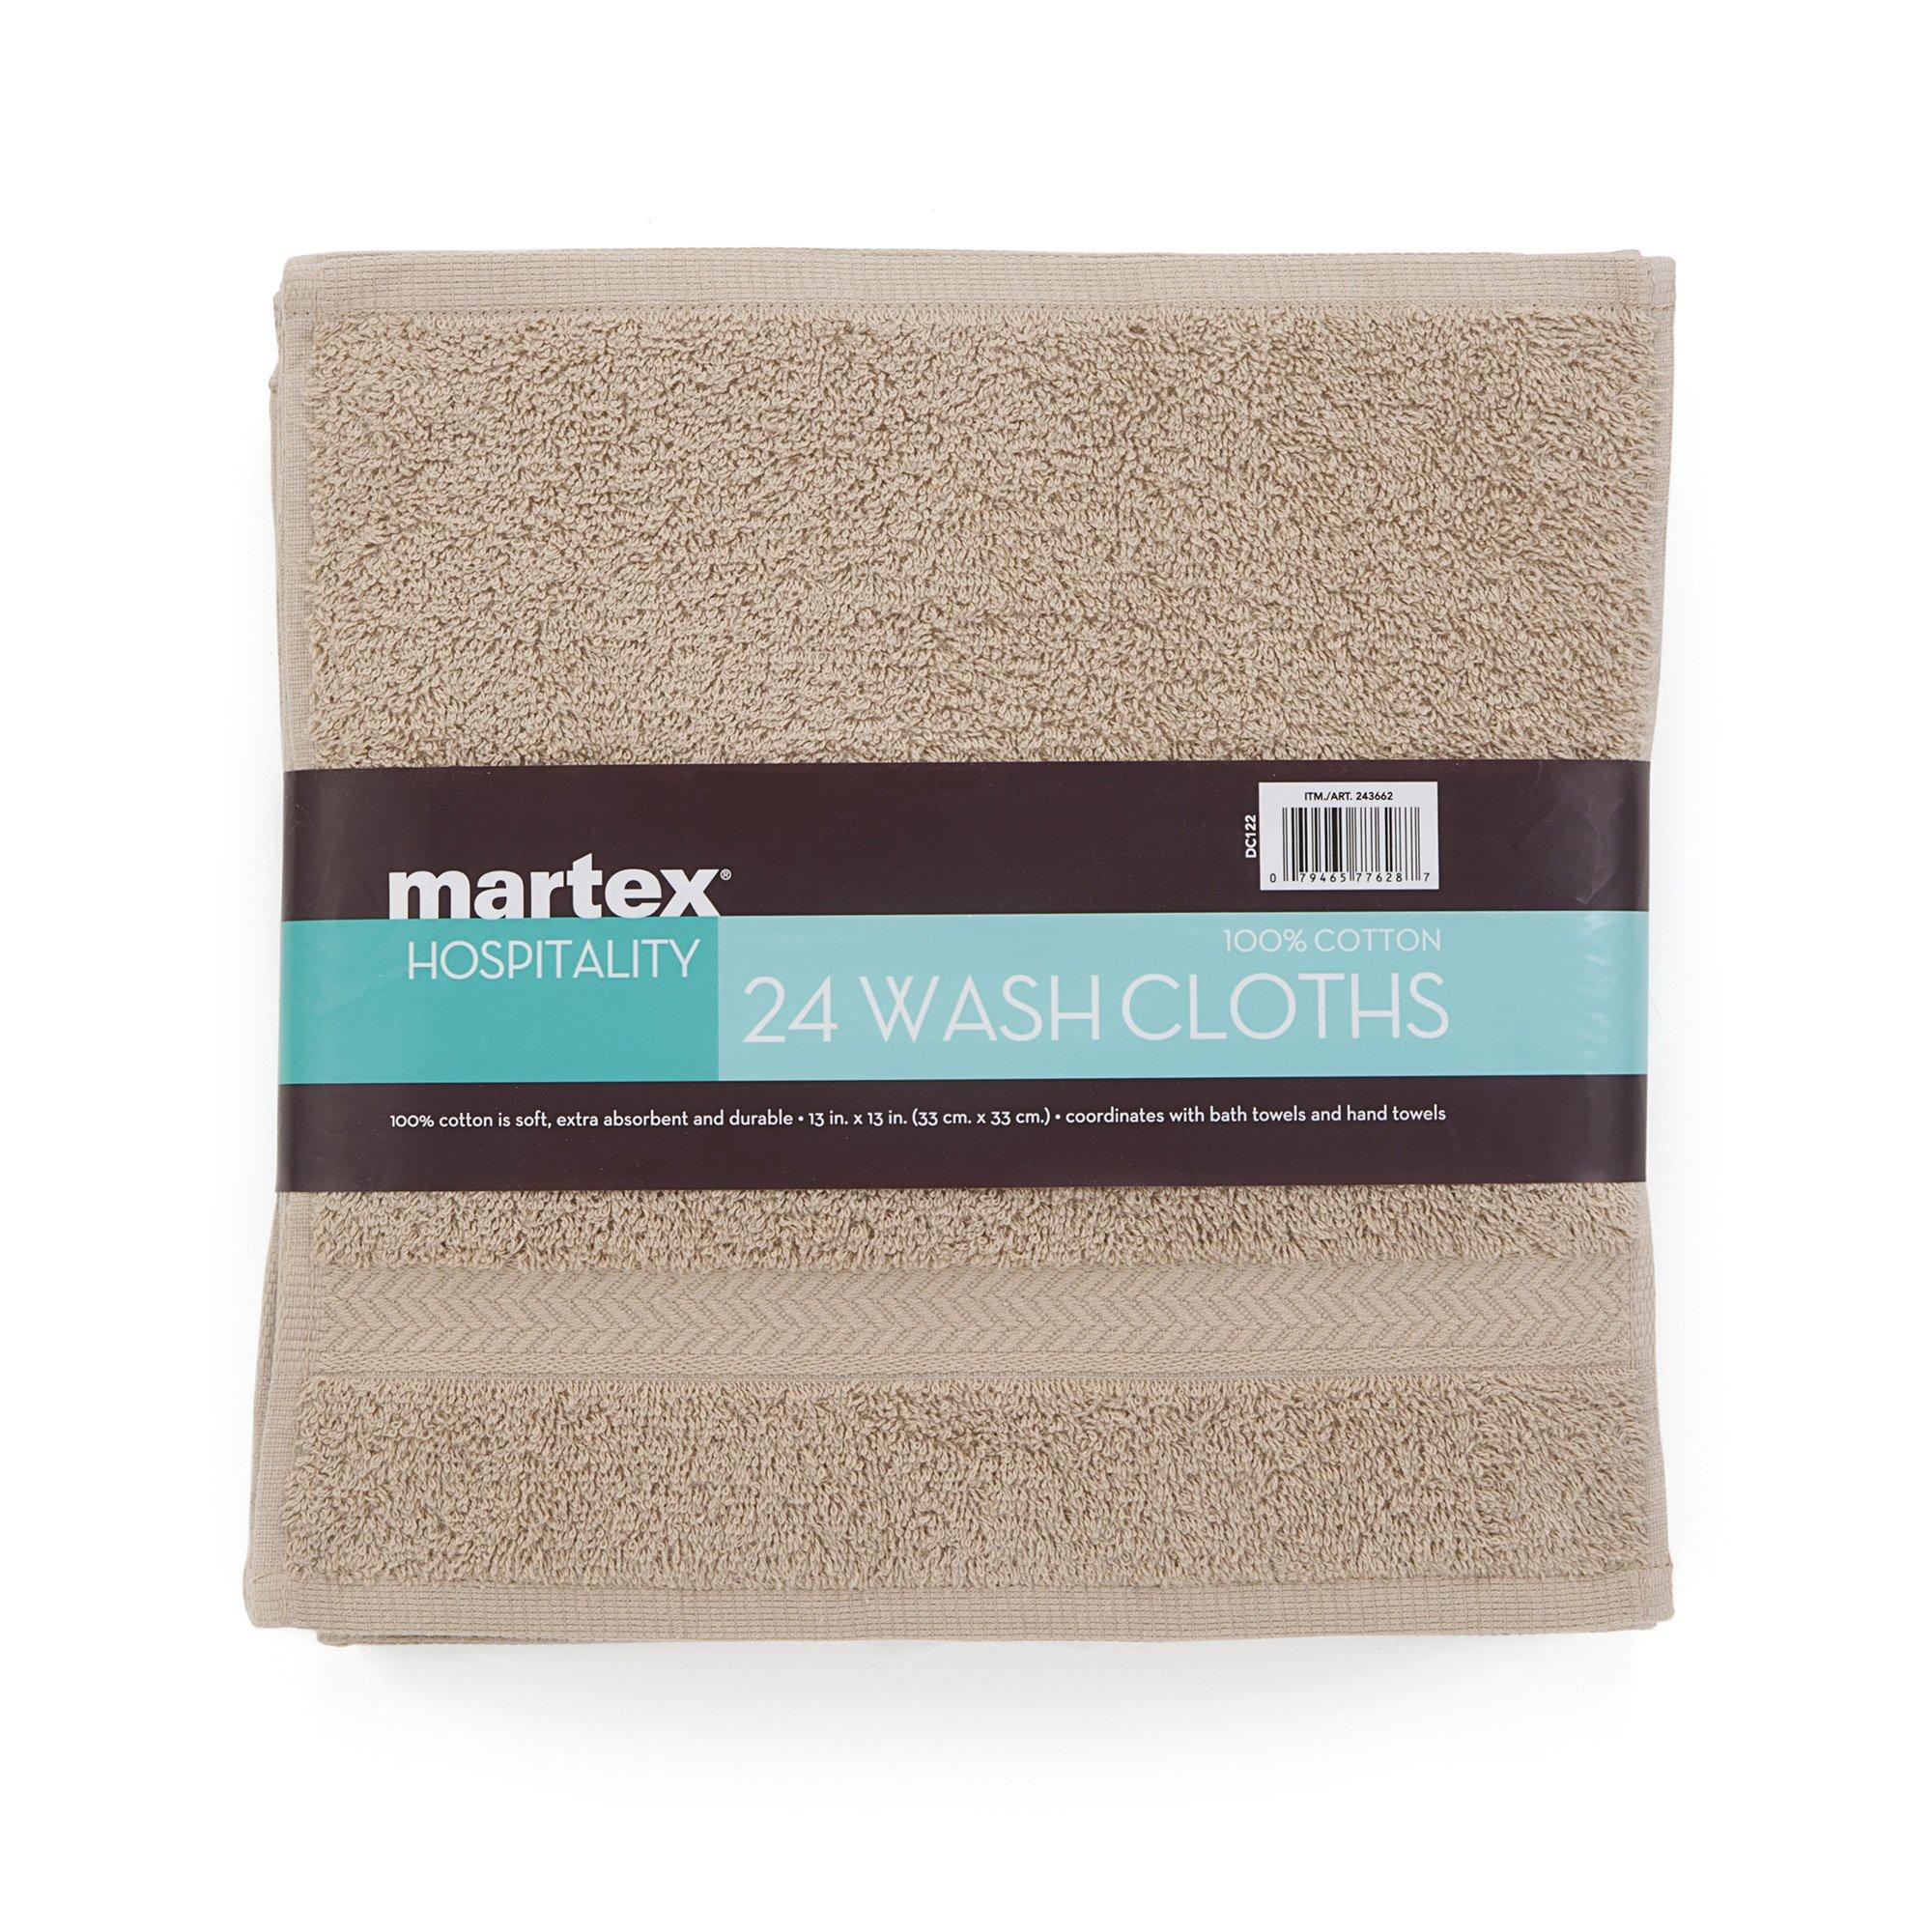 COMMERCIAL 24 PIECE WASH CLOTH  TOWEL SET BY MARTEX -  24 Wash Cloths, Home, Shower, Tub, Gym, Pool  - Machine Washable, Absorbent, Professional Grade, Hotel Quality - KHAKI